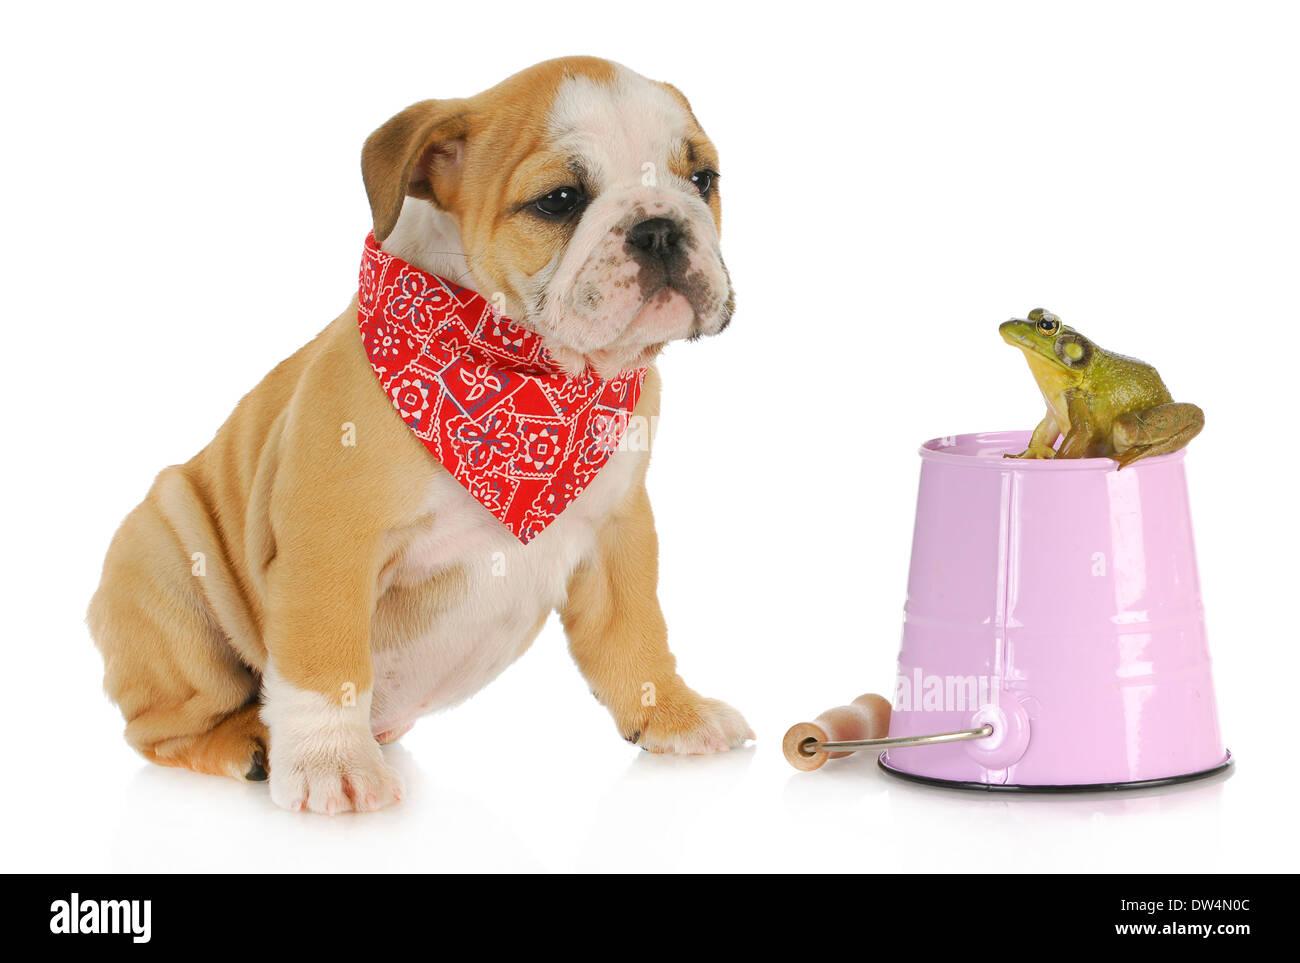 Grazioso Cucciolo Con Bullfrog Bulldog Inglese Guardando Bullfrog